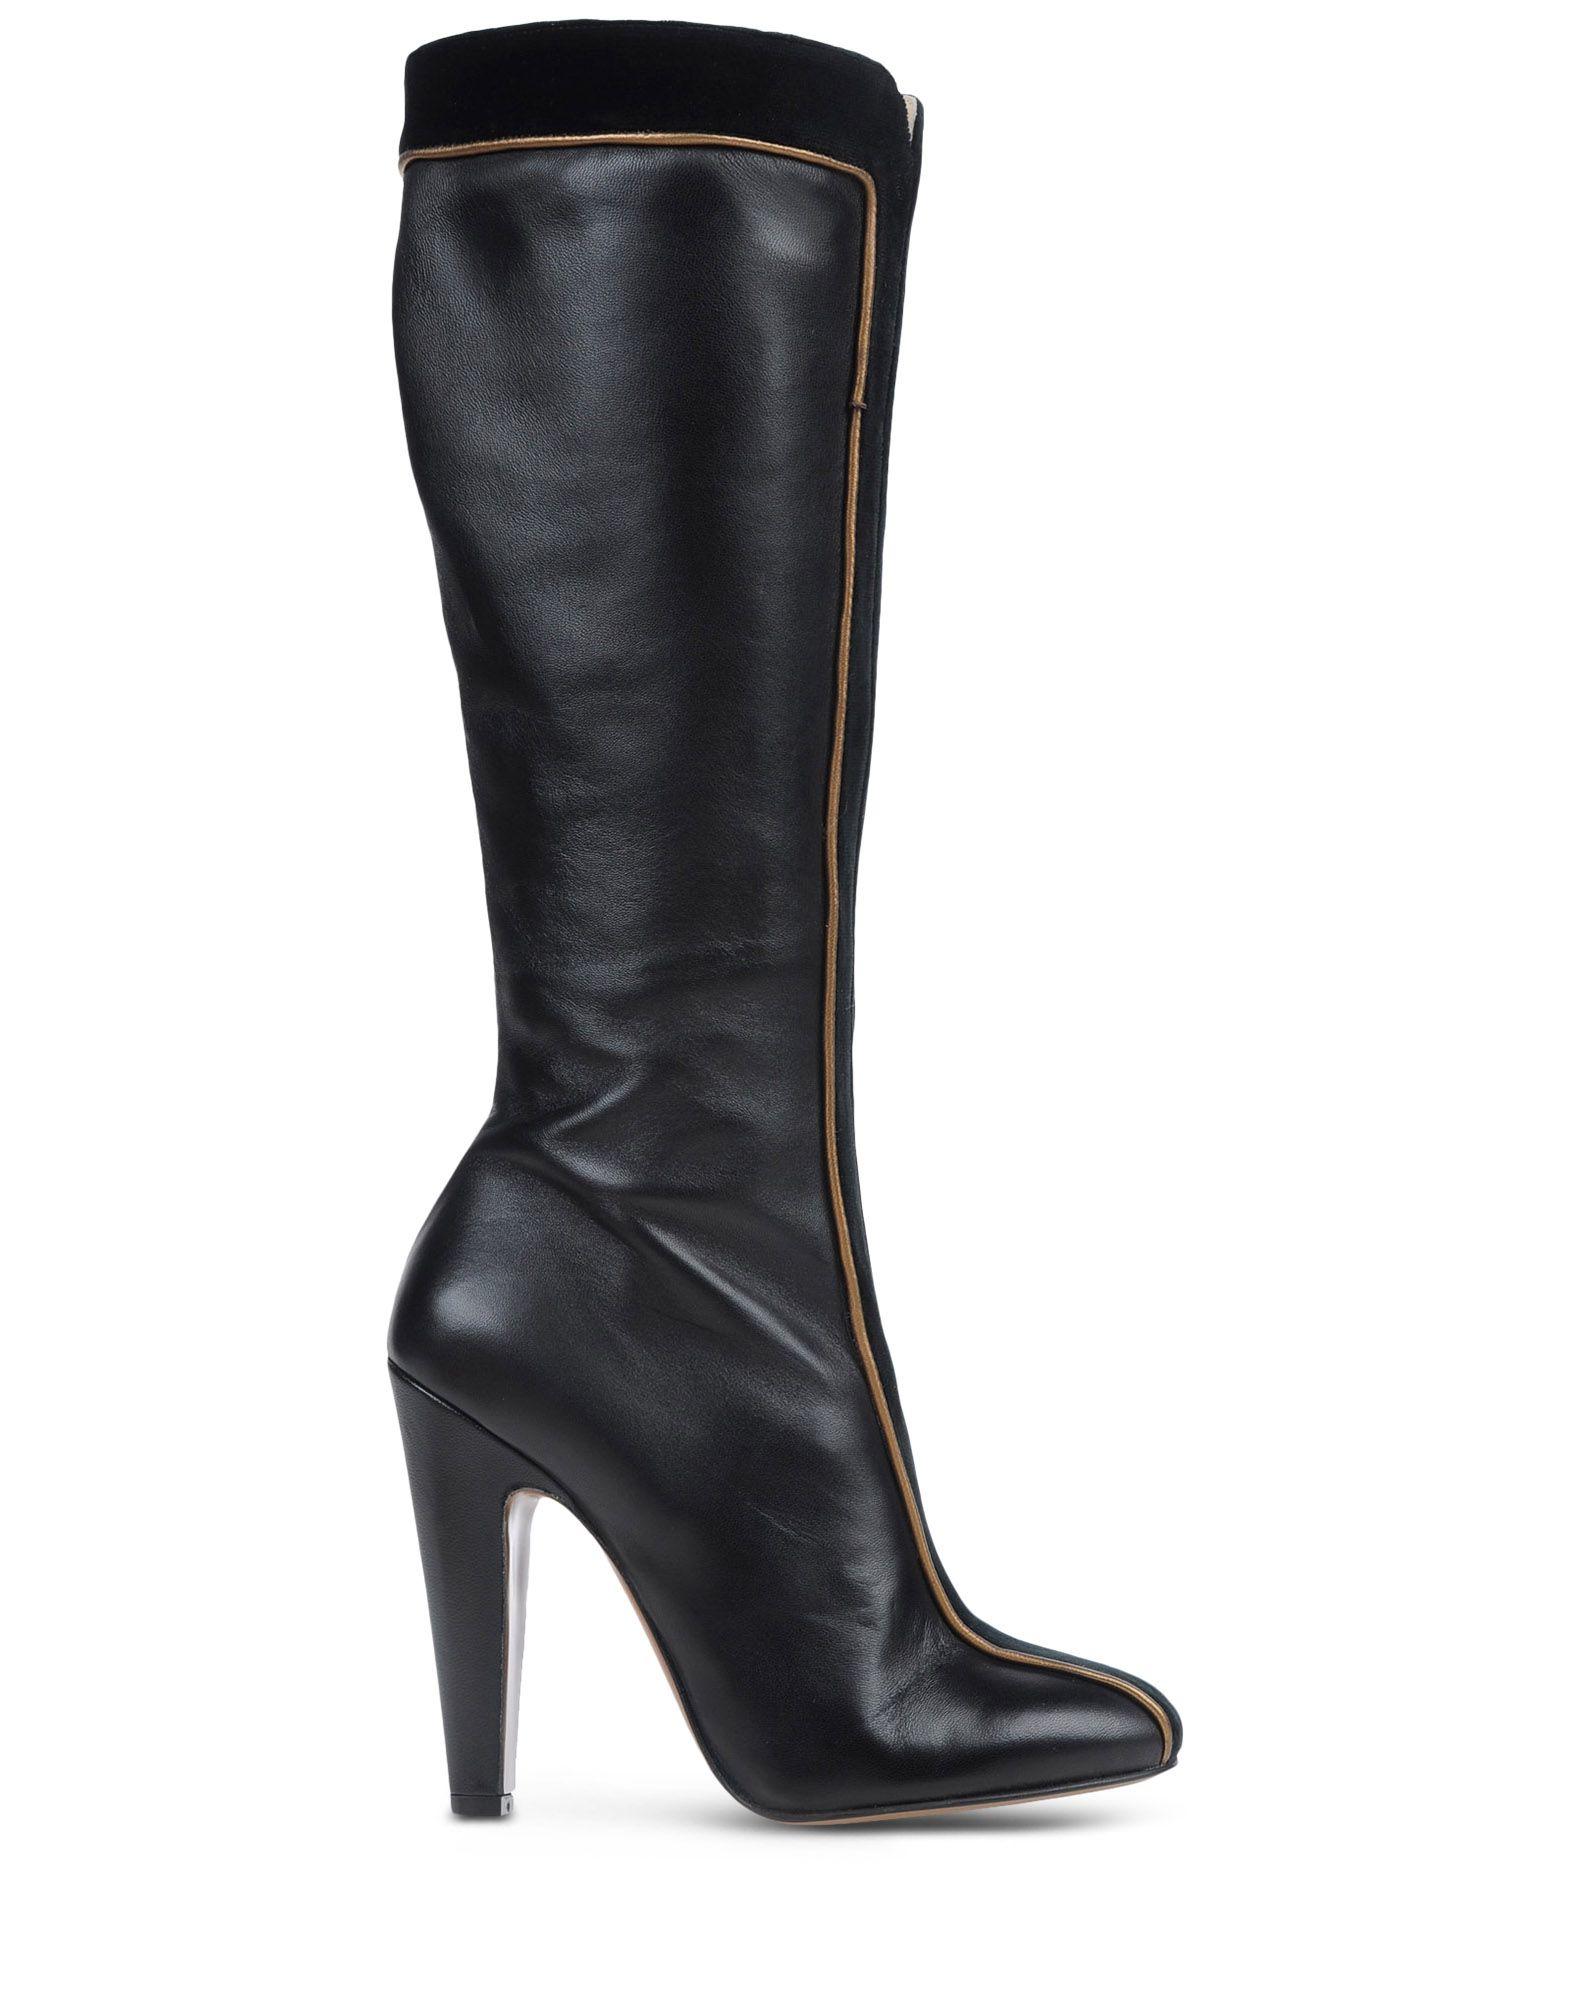 l 39 autre chose boots in black lyst. Black Bedroom Furniture Sets. Home Design Ideas